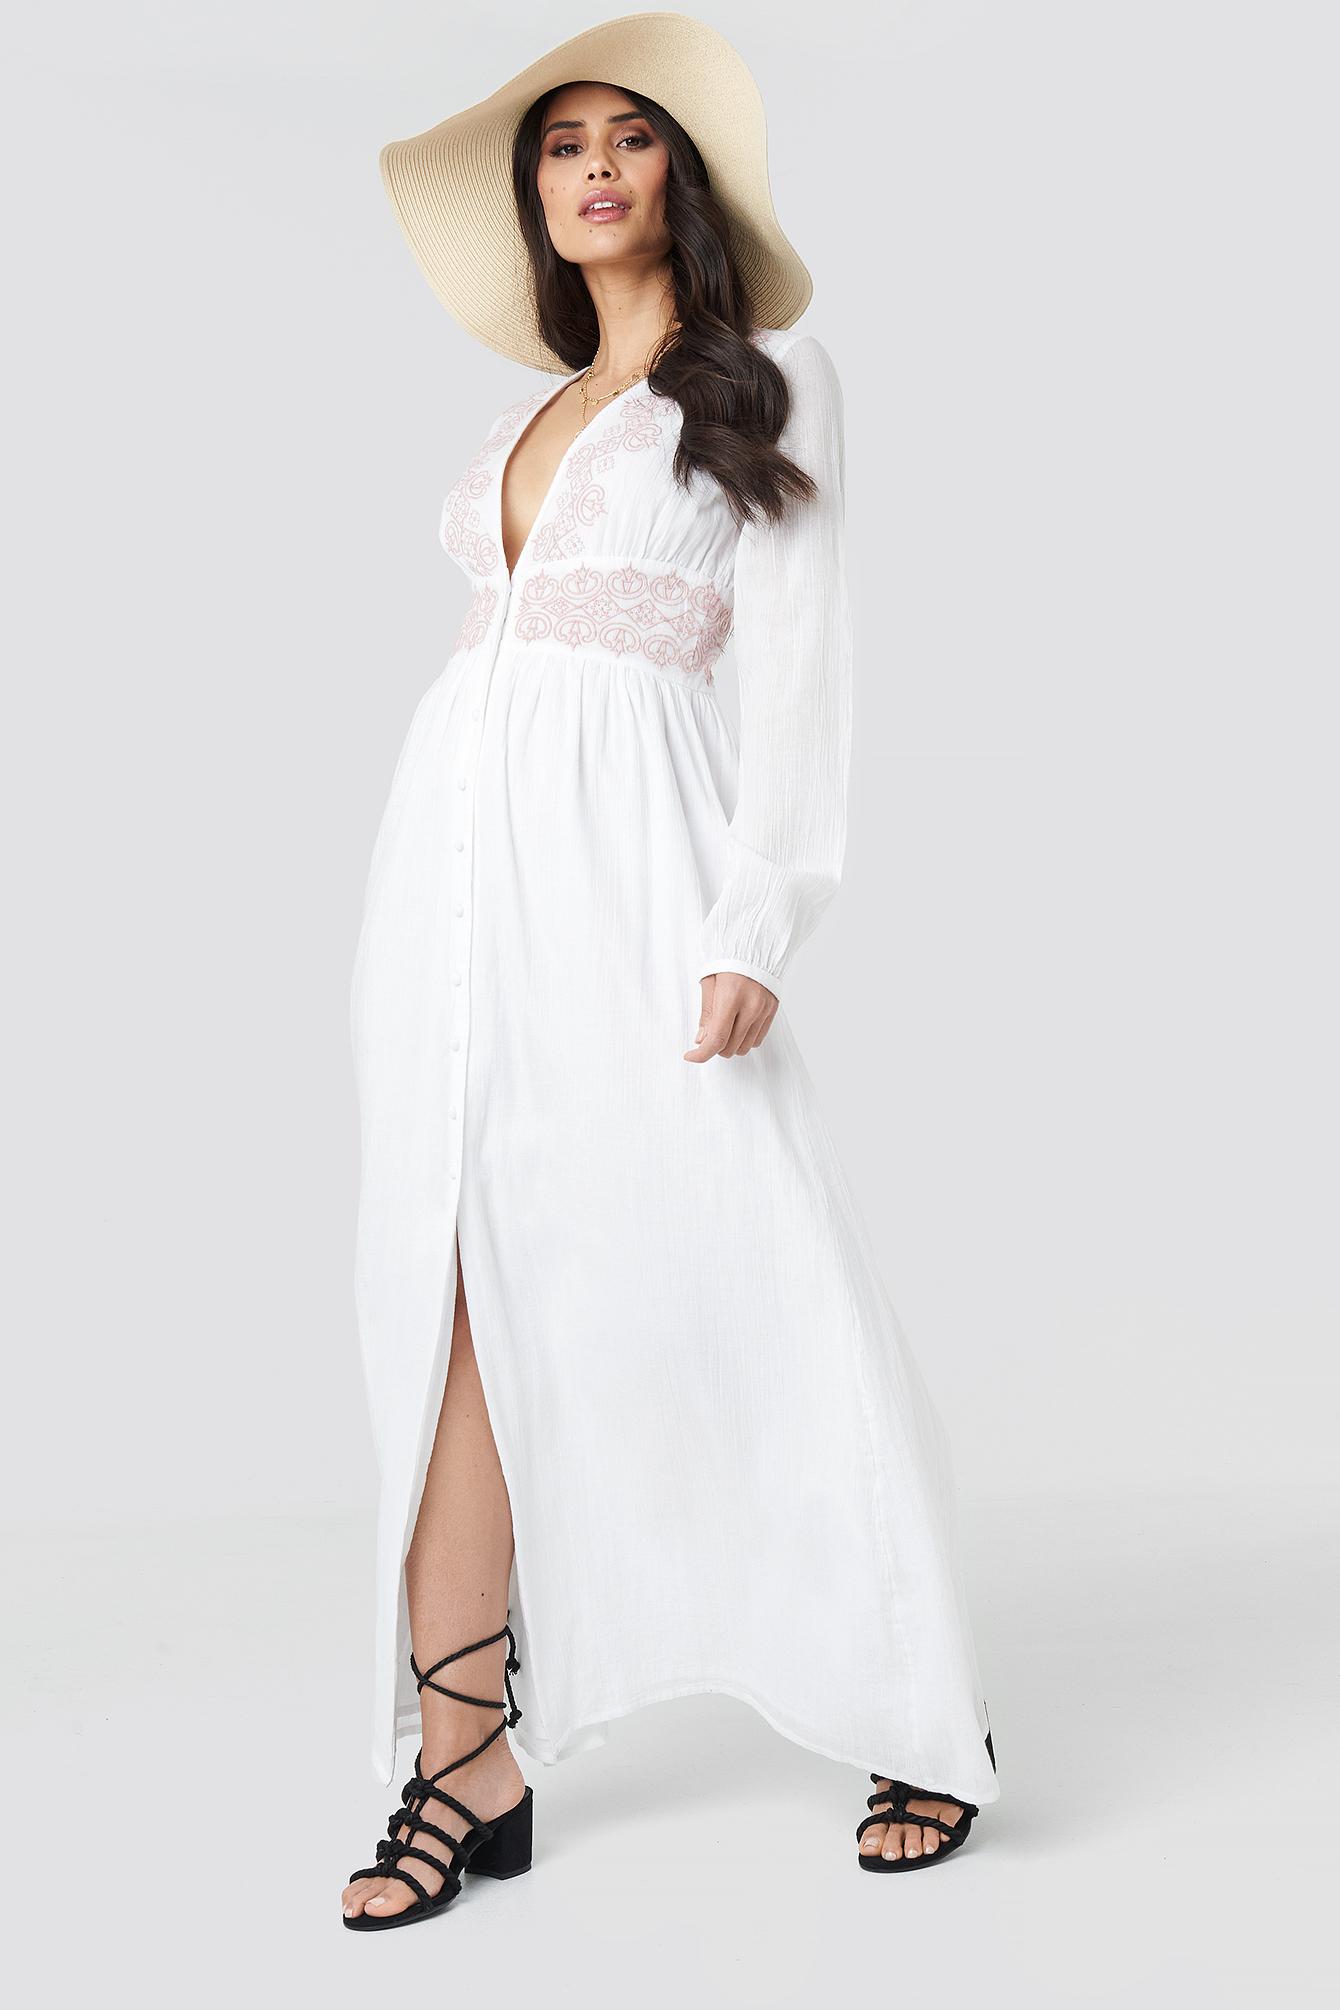 luisa lion x na-kd -  Waist Detail Button Up Dress - White